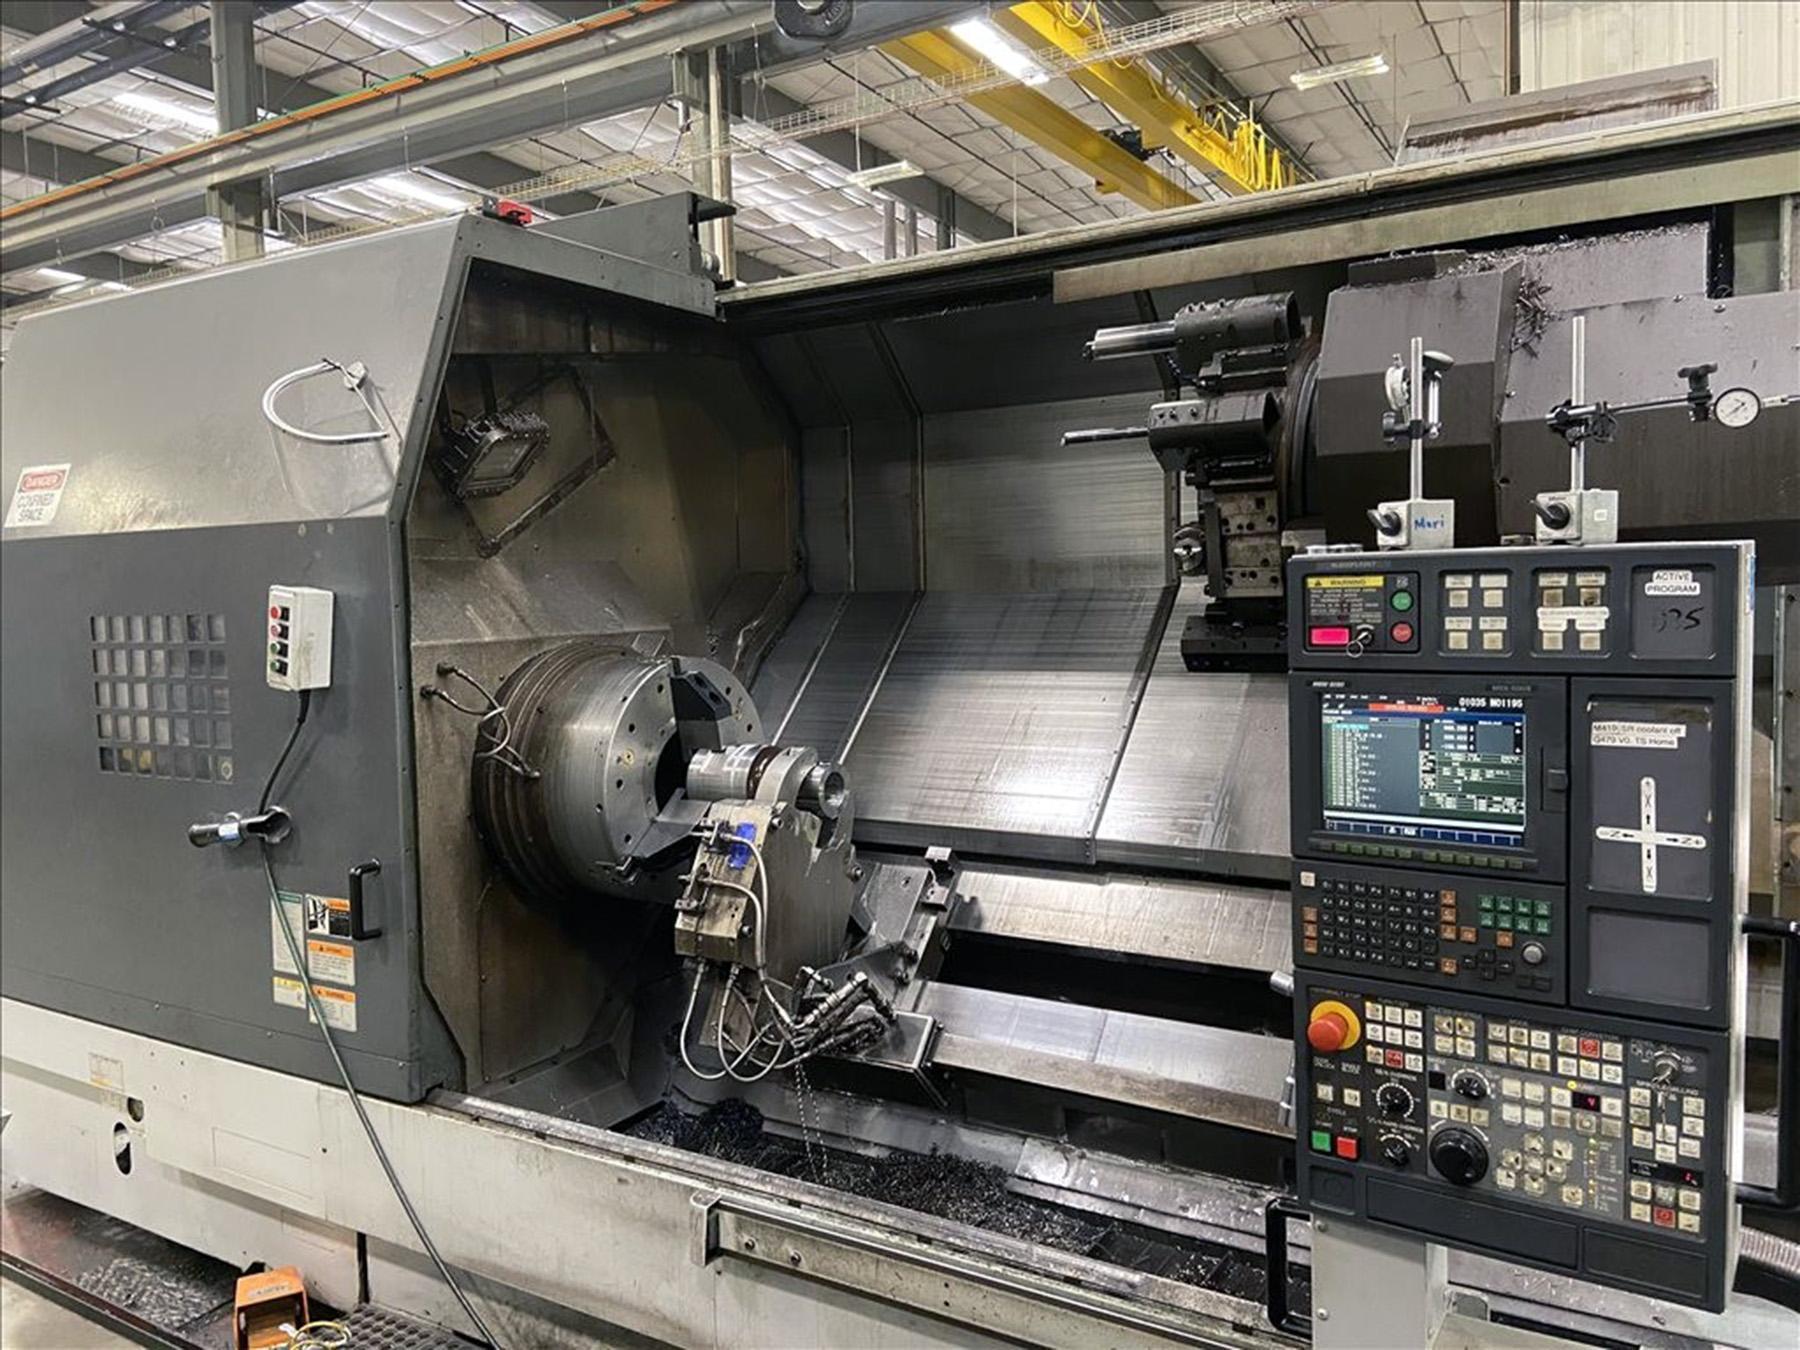 USED, MORI SEIKI SL-603CMC/3000 CNC TURNING CENTER WITH LIVE TOOLING